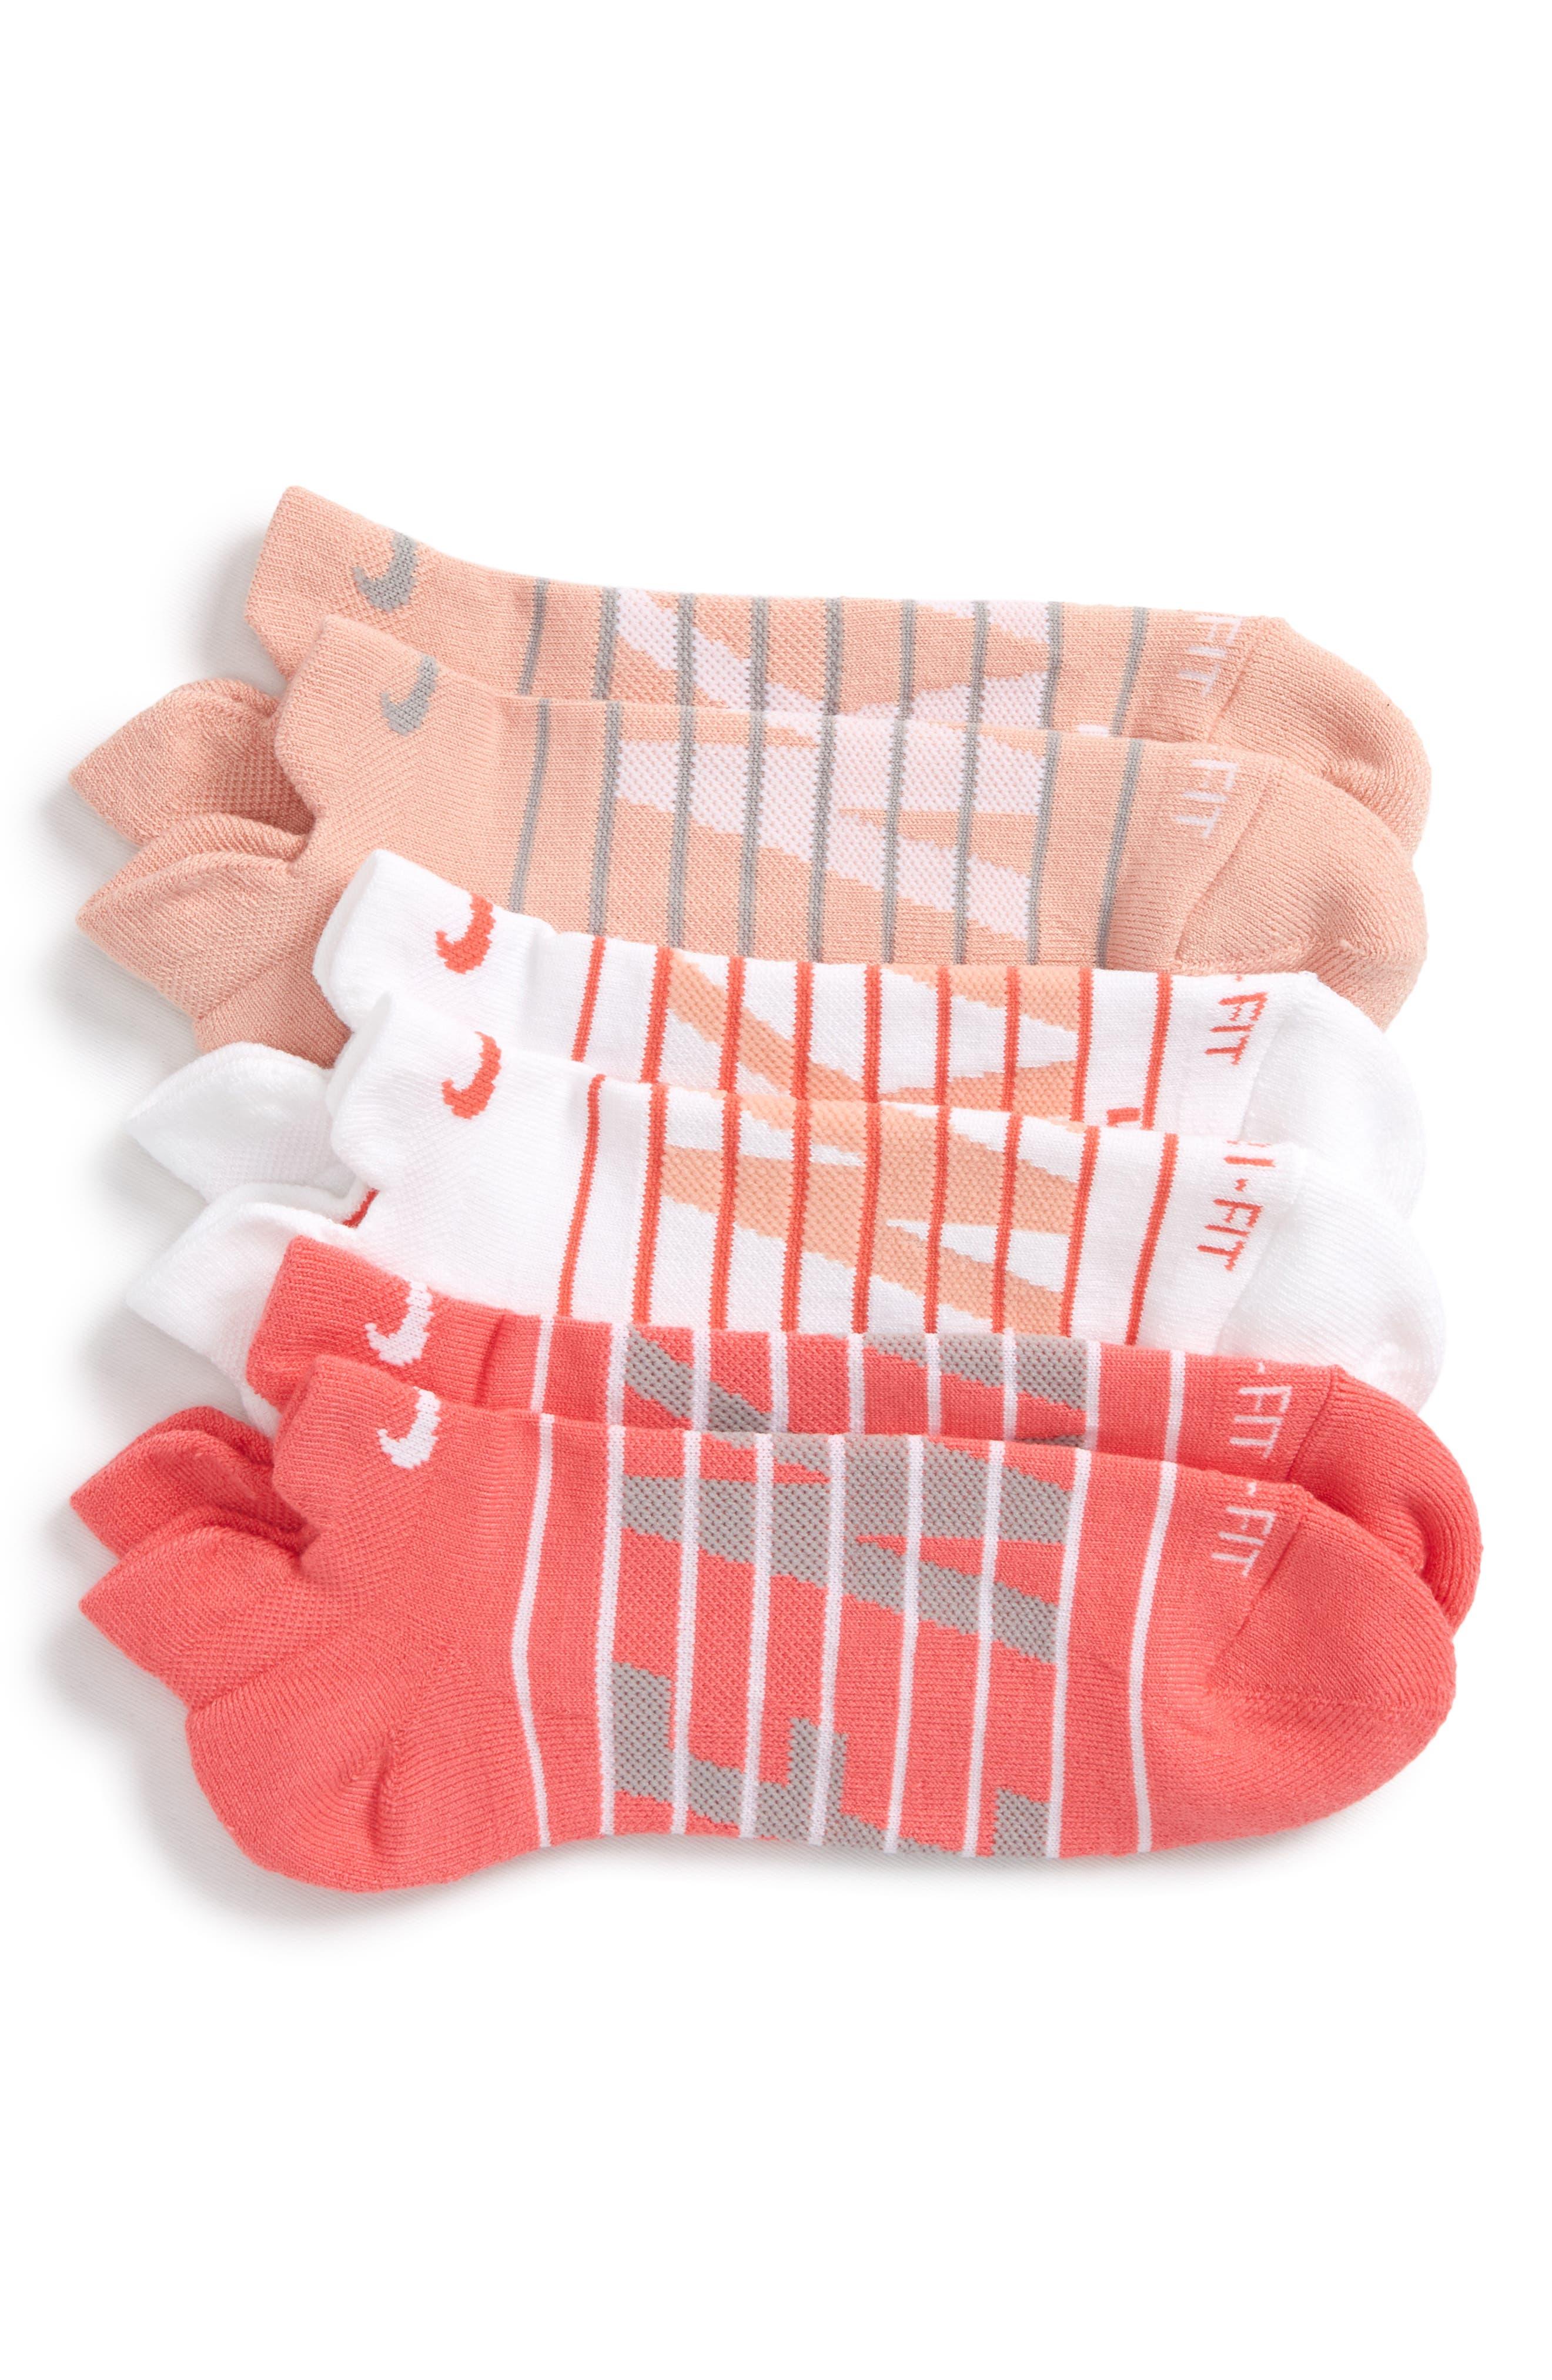 Dry Cushion 3-Pack Low-Cut Socks,                             Main thumbnail 1, color,                             Coral Multi